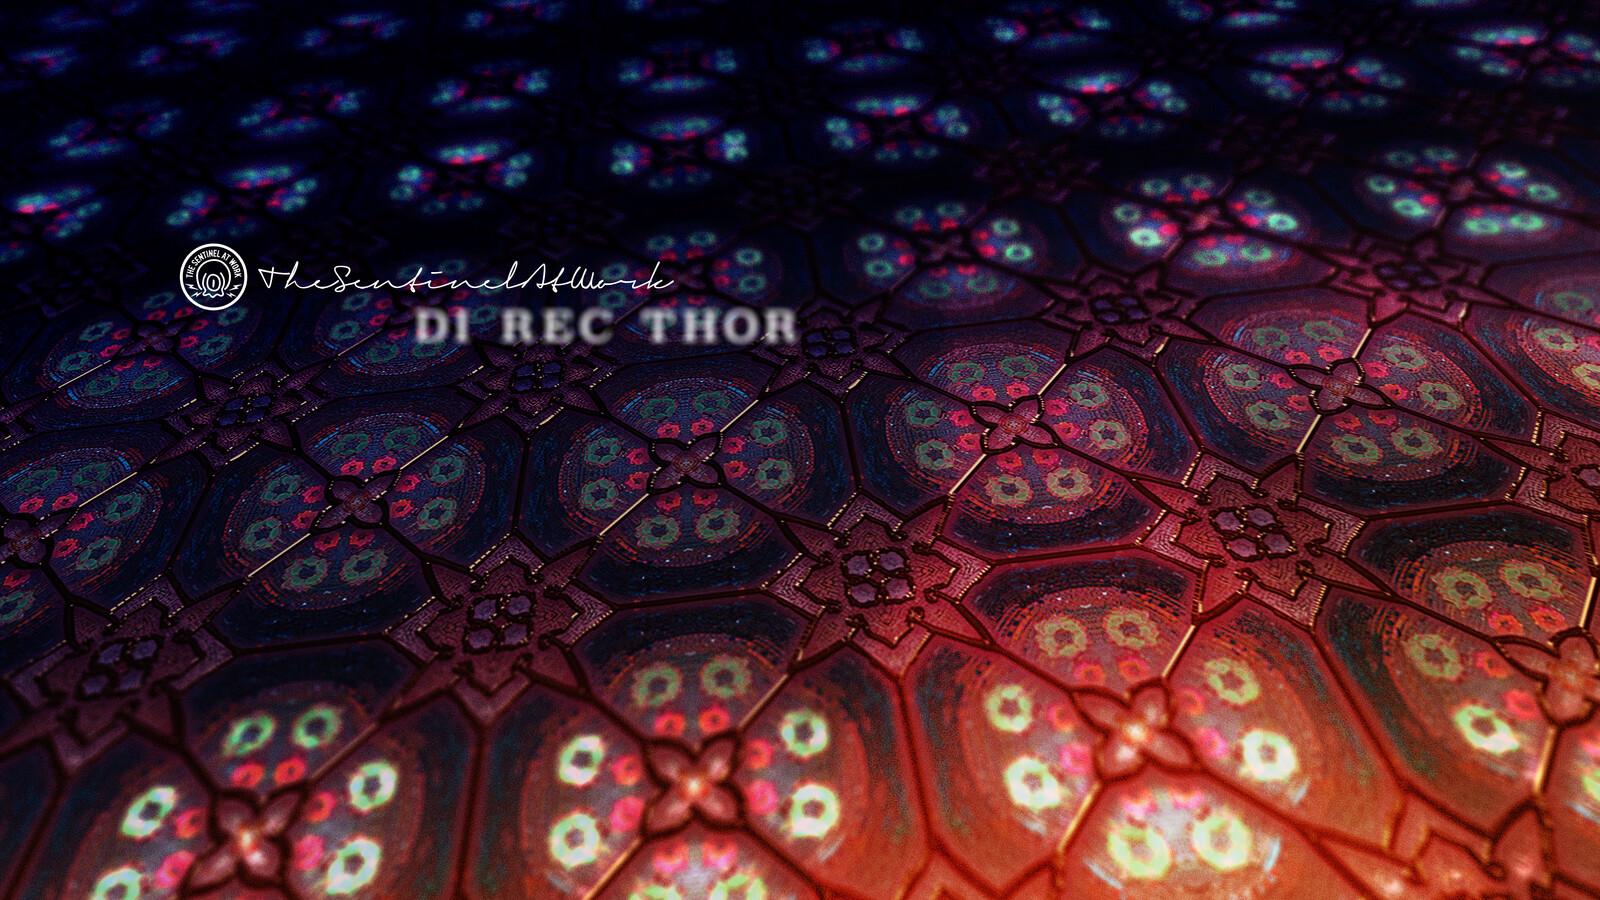 DI REC THOR, Opening credits design.